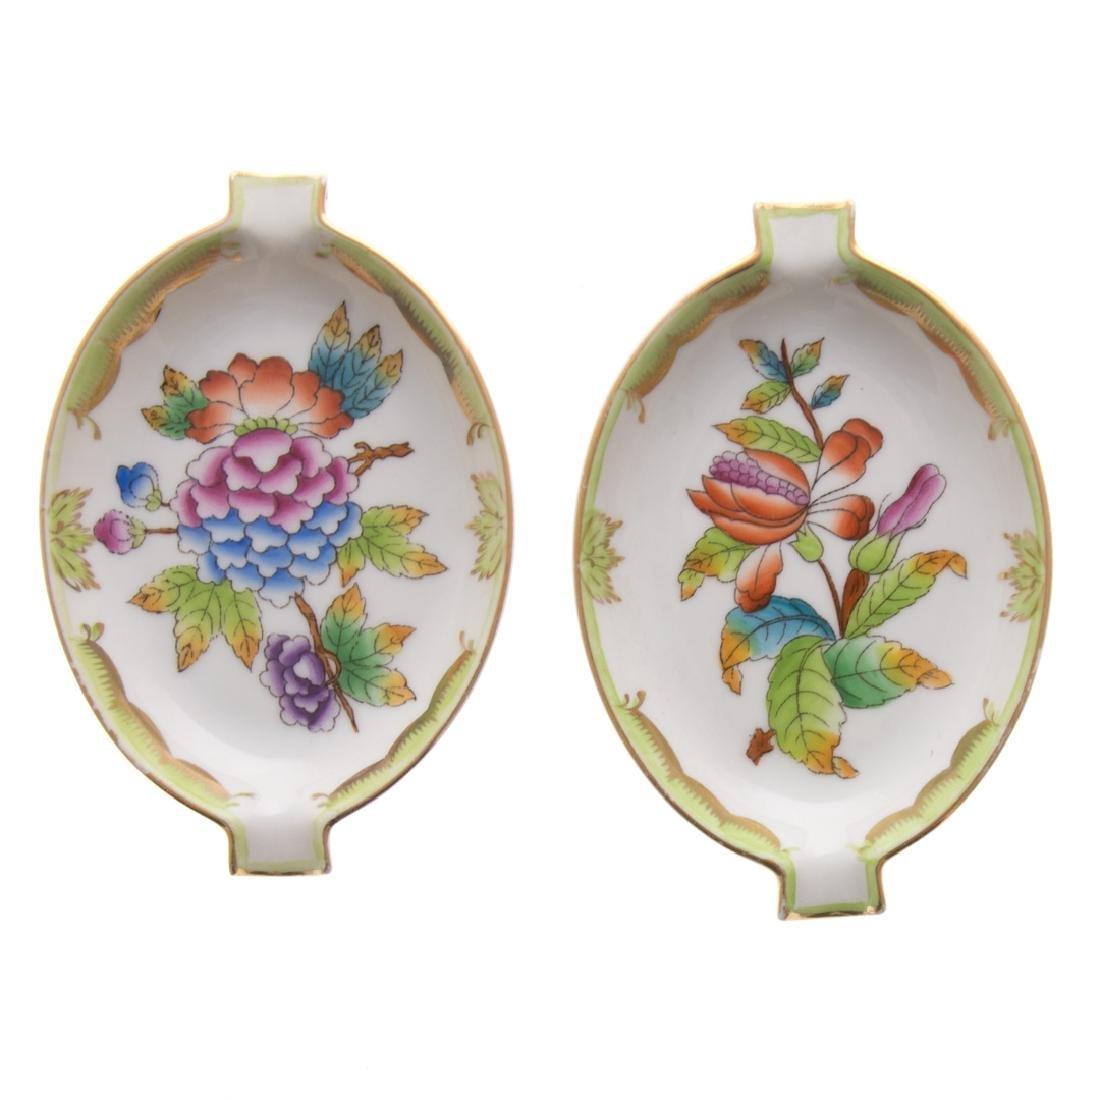 Six English and continental ceramic animals - 4